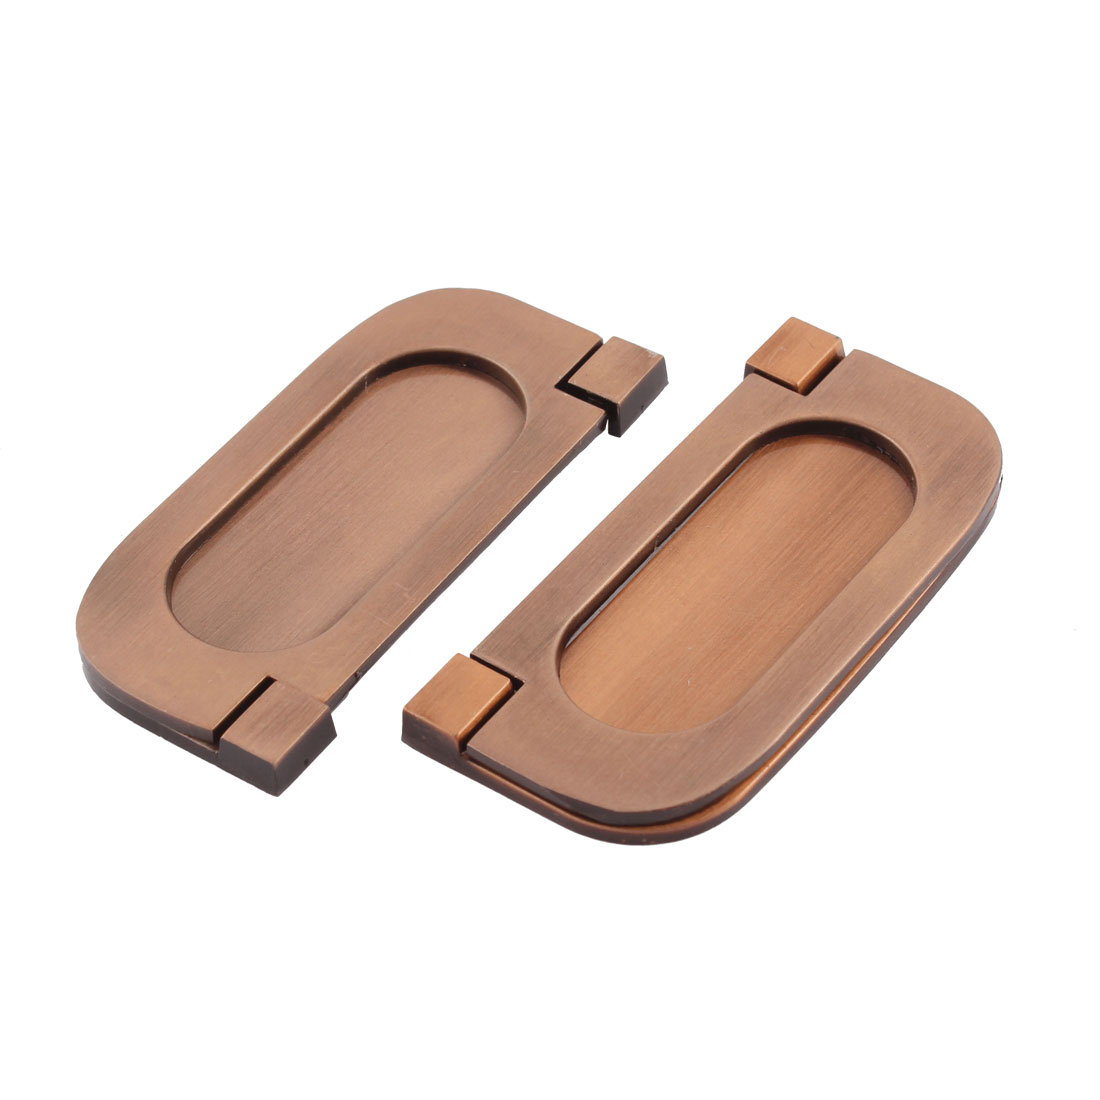 64mm Fixing Distance Cabinet Copper Tone Zinc Alloy Rectangle Pull Handle 2 Pcs